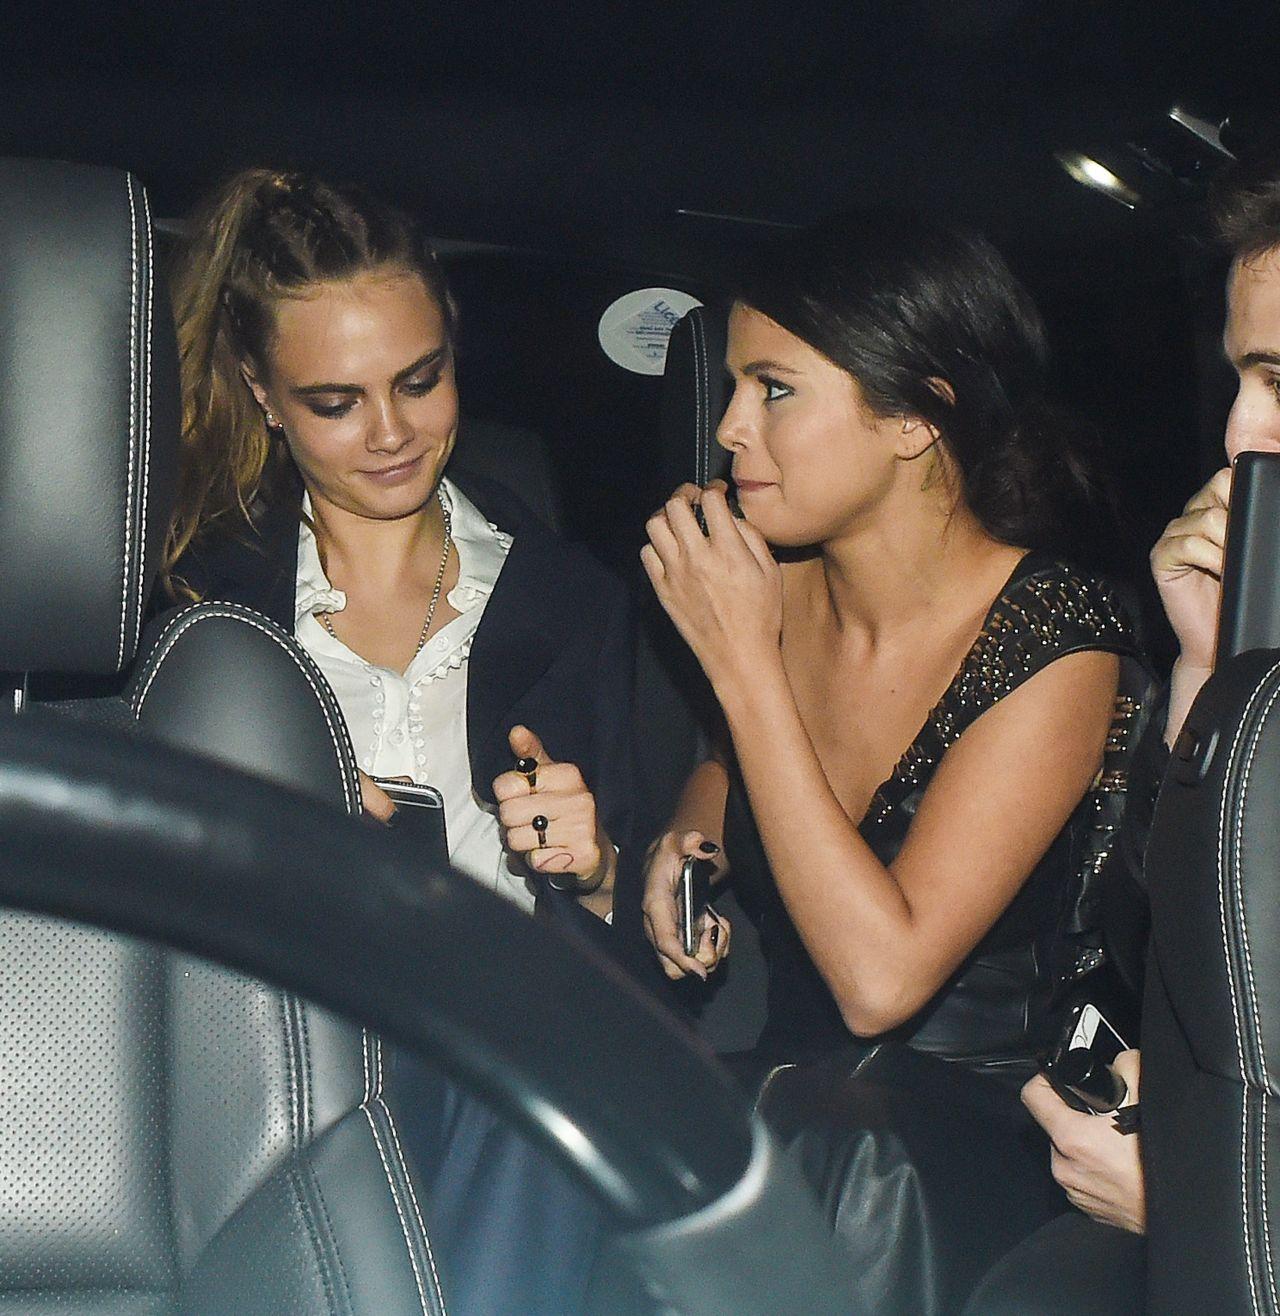 Selena Gomez & Cara Delevingne at LAX Airport in LA - July